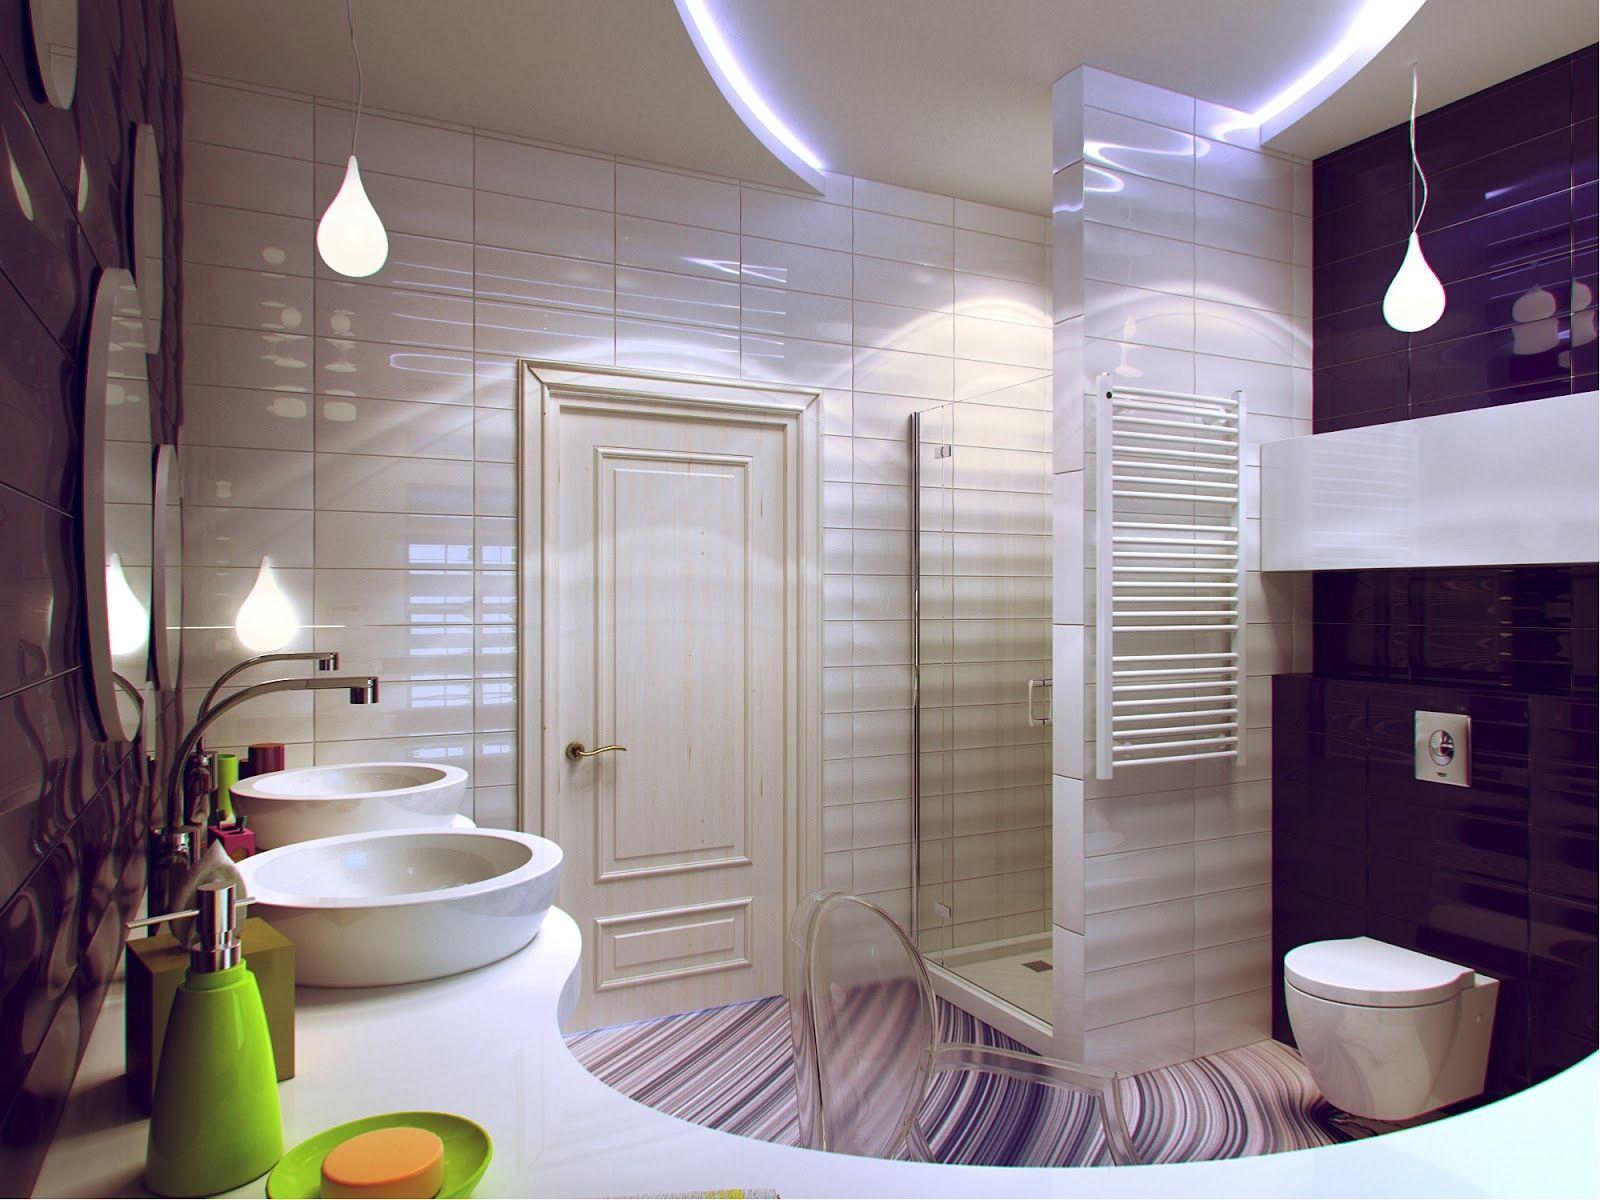 small bathroom decorating ideas purple | house possible